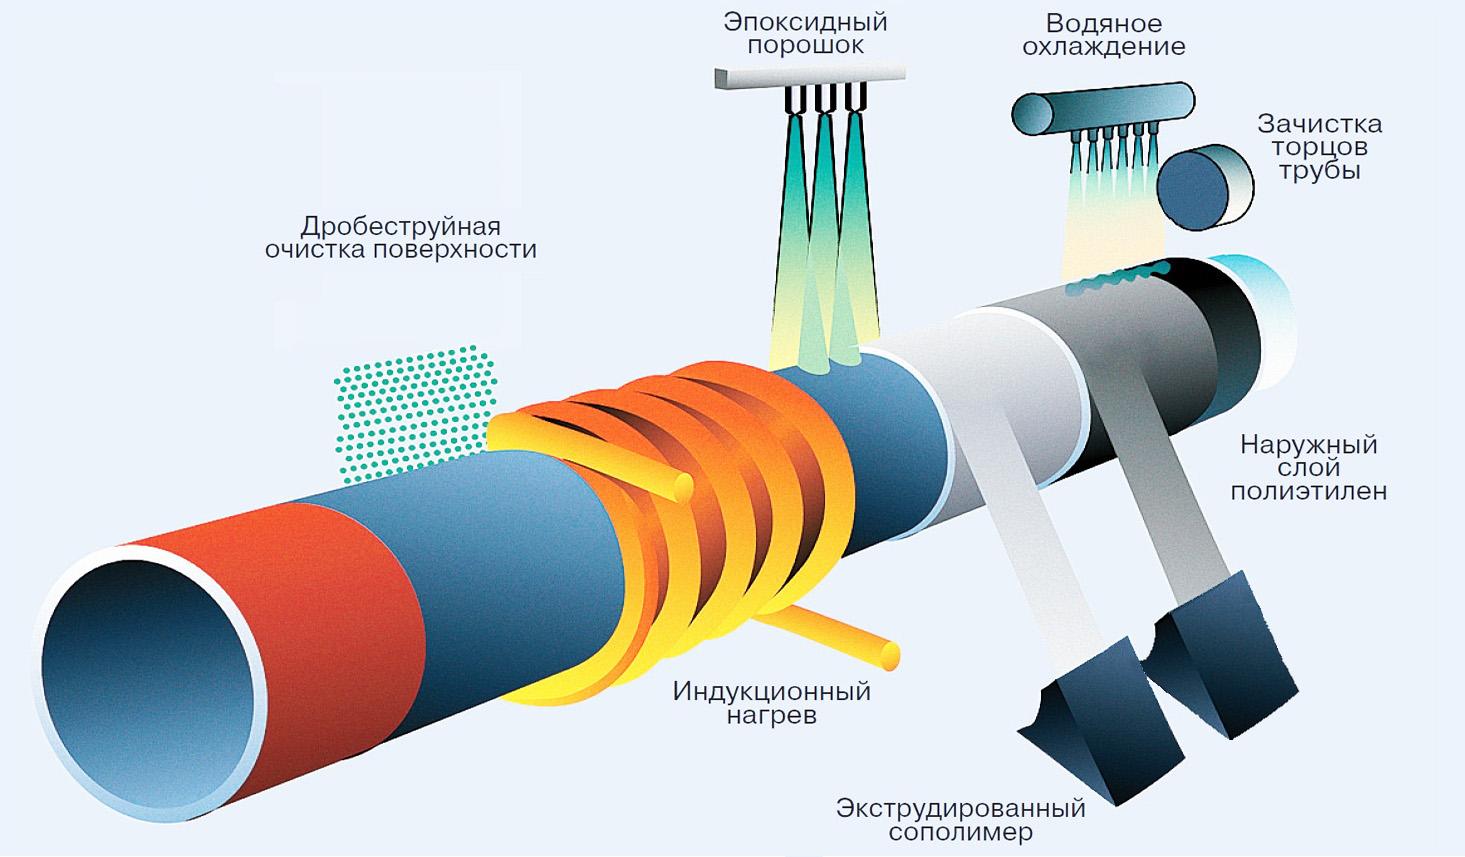 Вус изоляция труб: применение, характеристики, эксплуатация